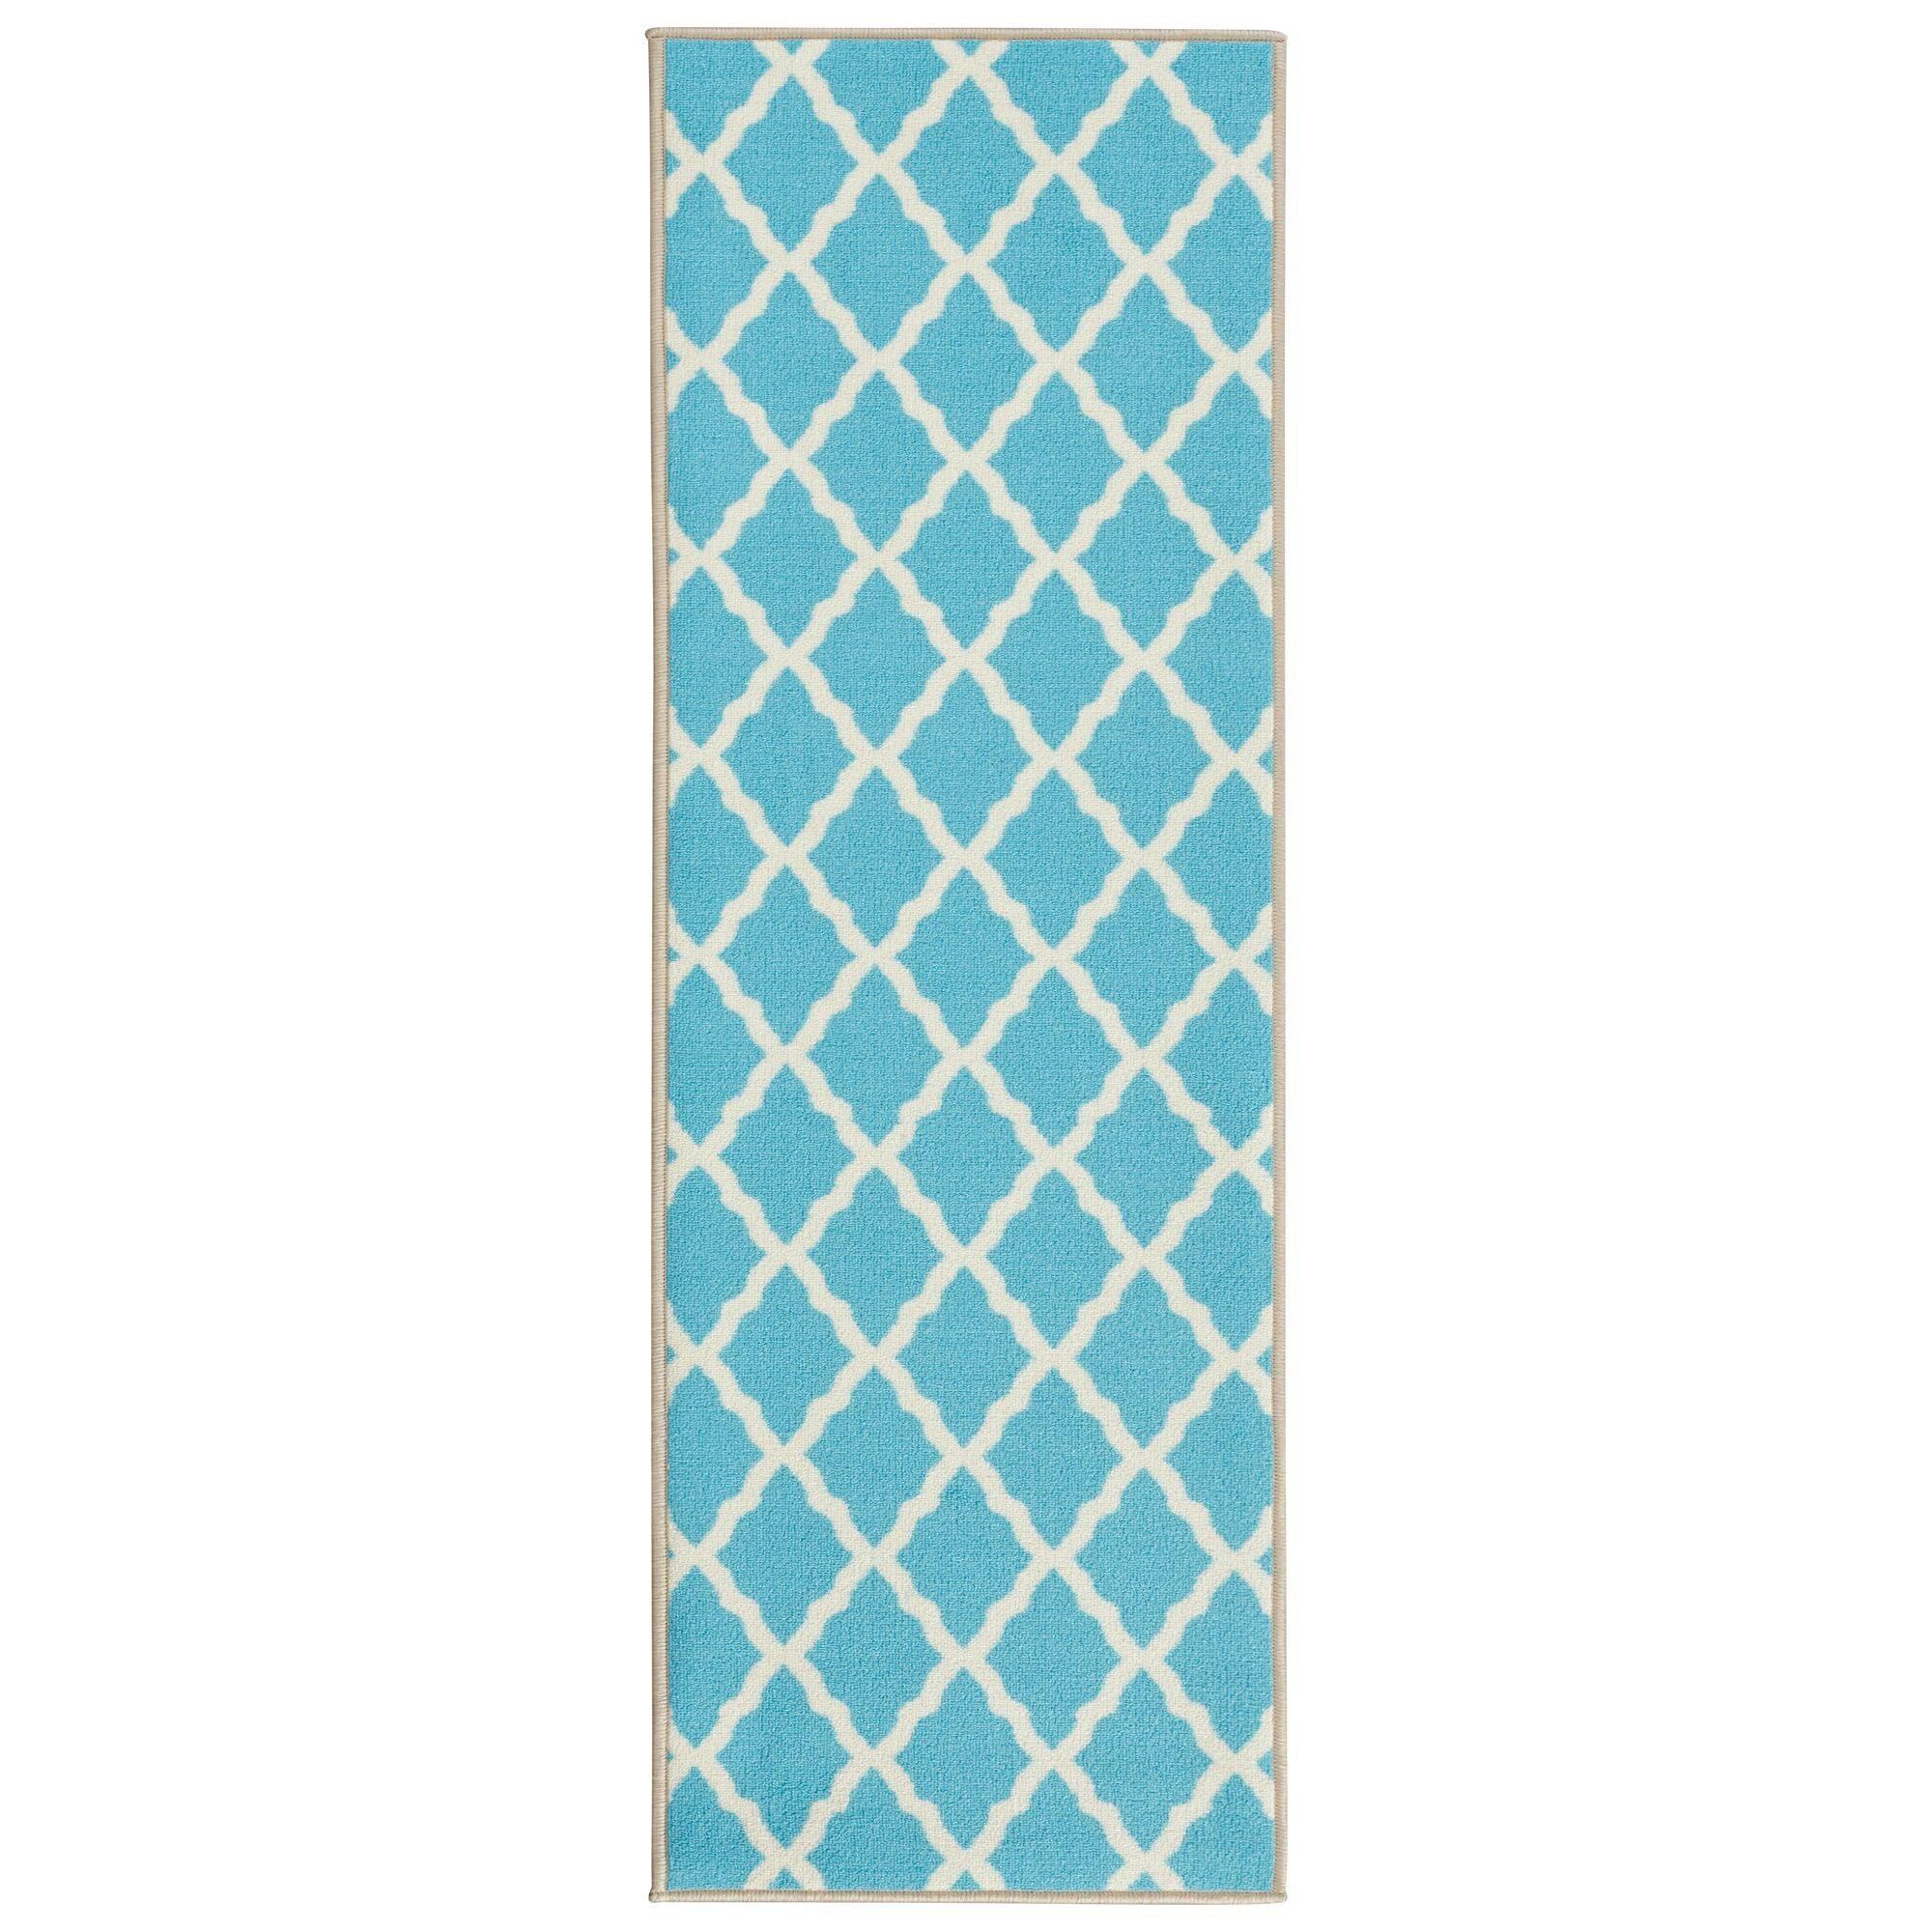 Staunton Blue Area Rug Rug Size: Rectangle 3'3